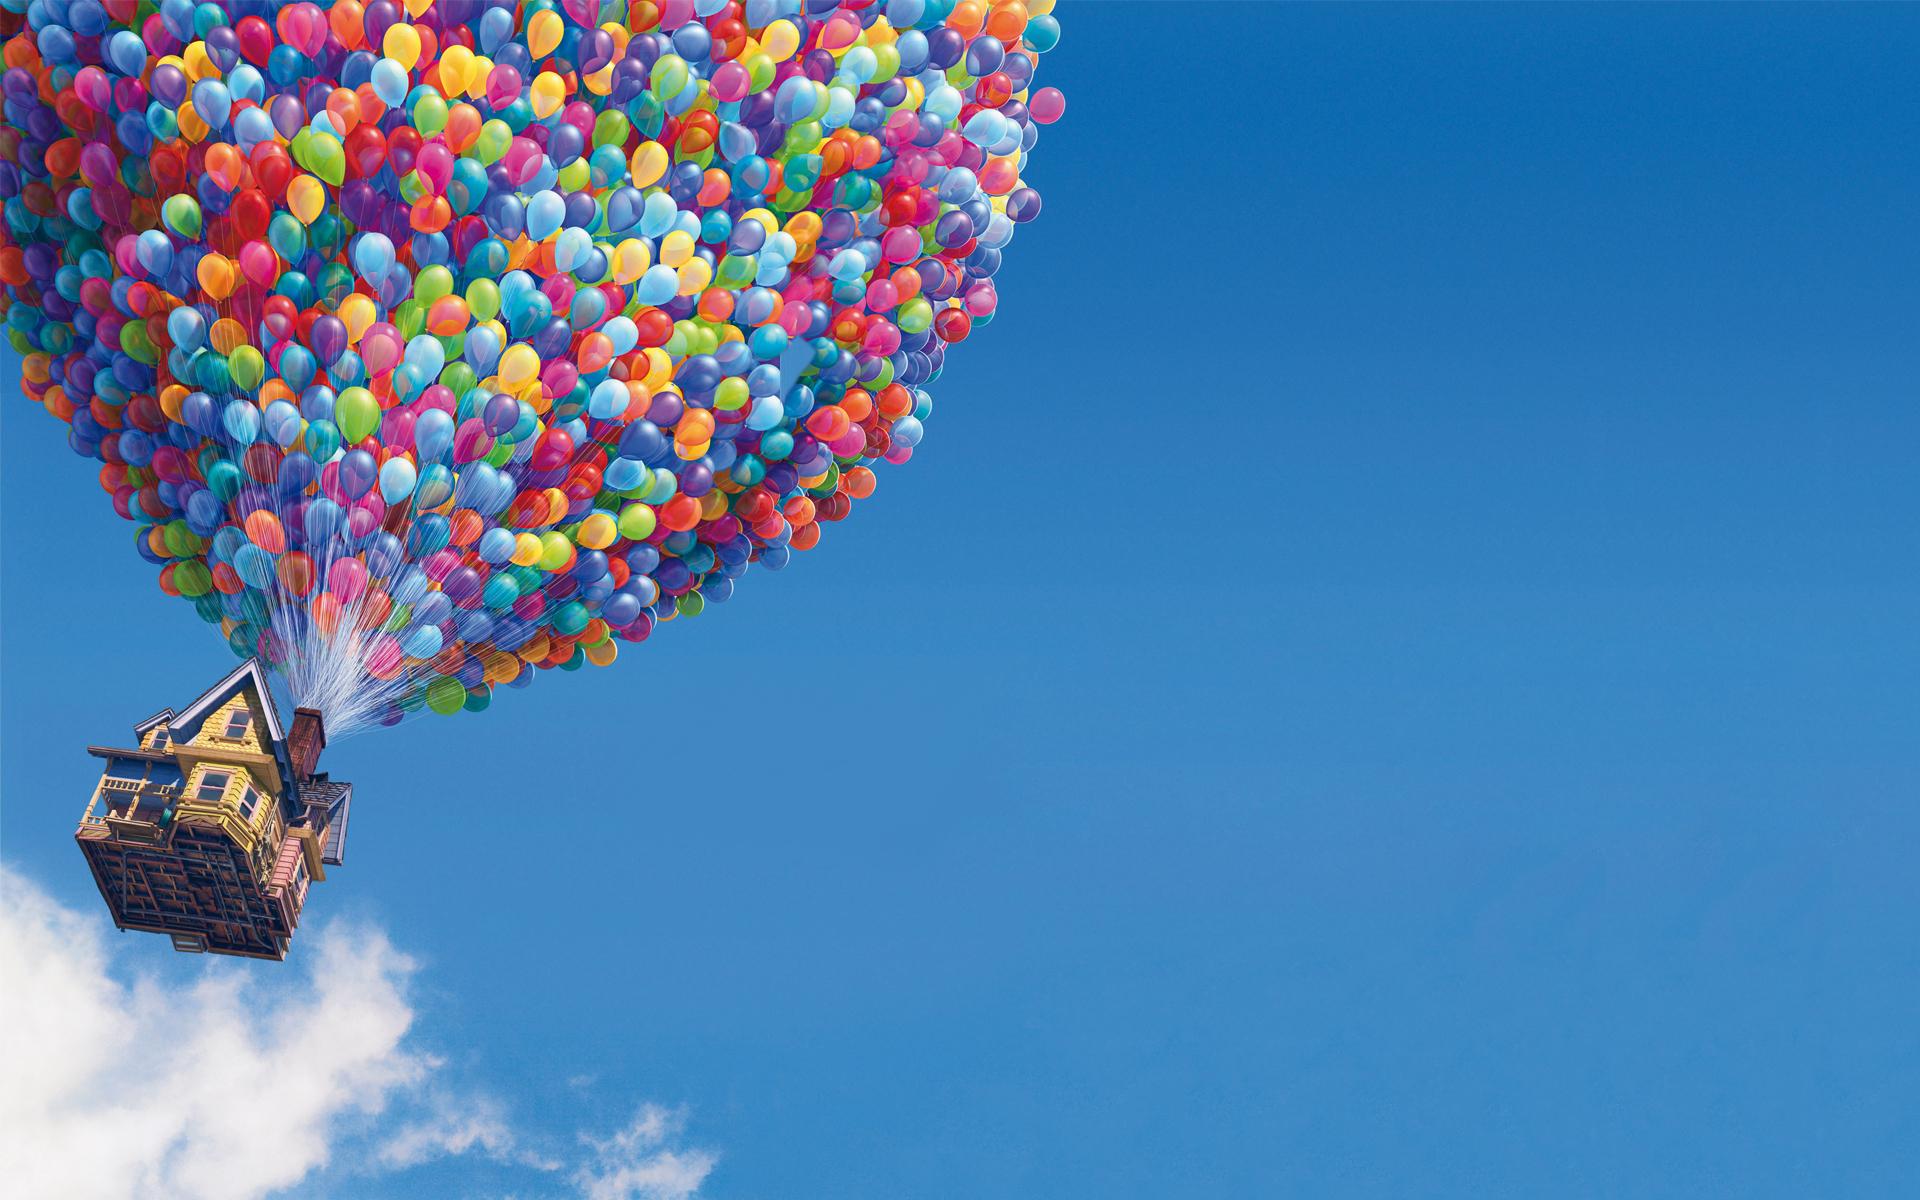 Millions Balloons Up - Millions Balloons Up